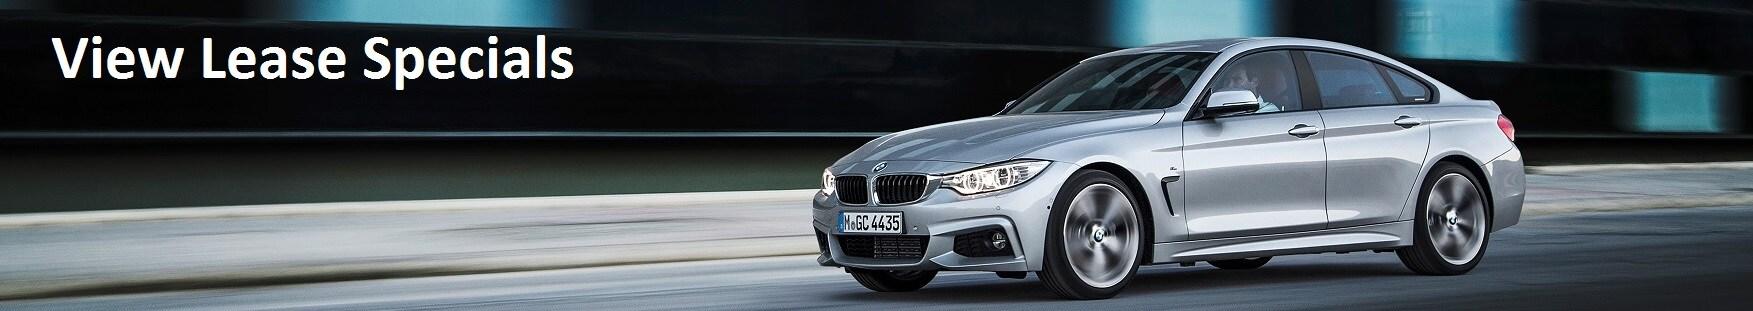 Buy or Lease BMW 4 Series Los Angeles Thousand Oaks Westlake